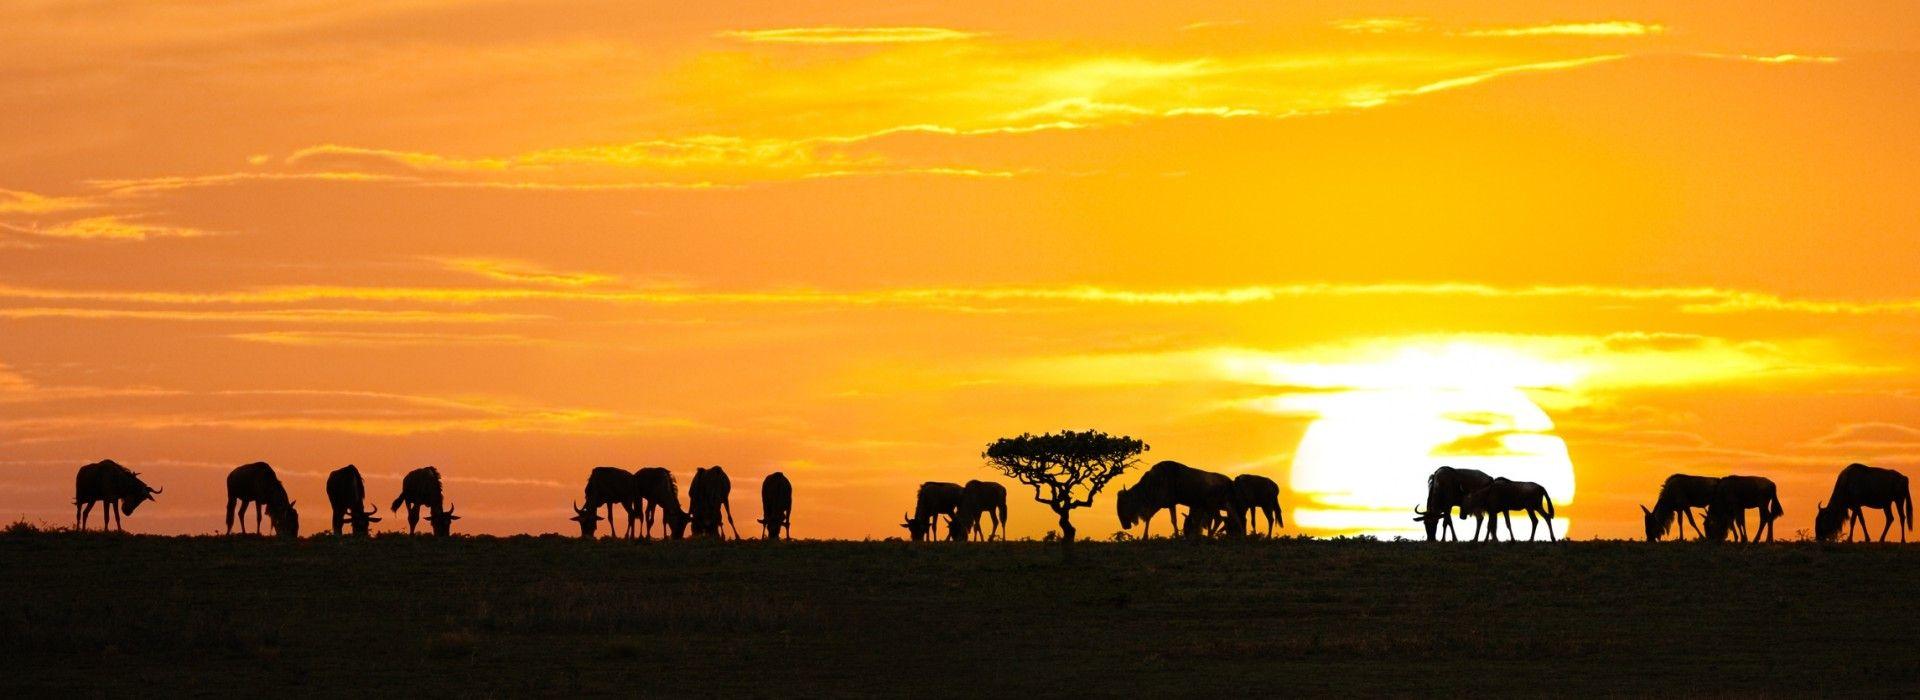 Walking tours in Tanzania